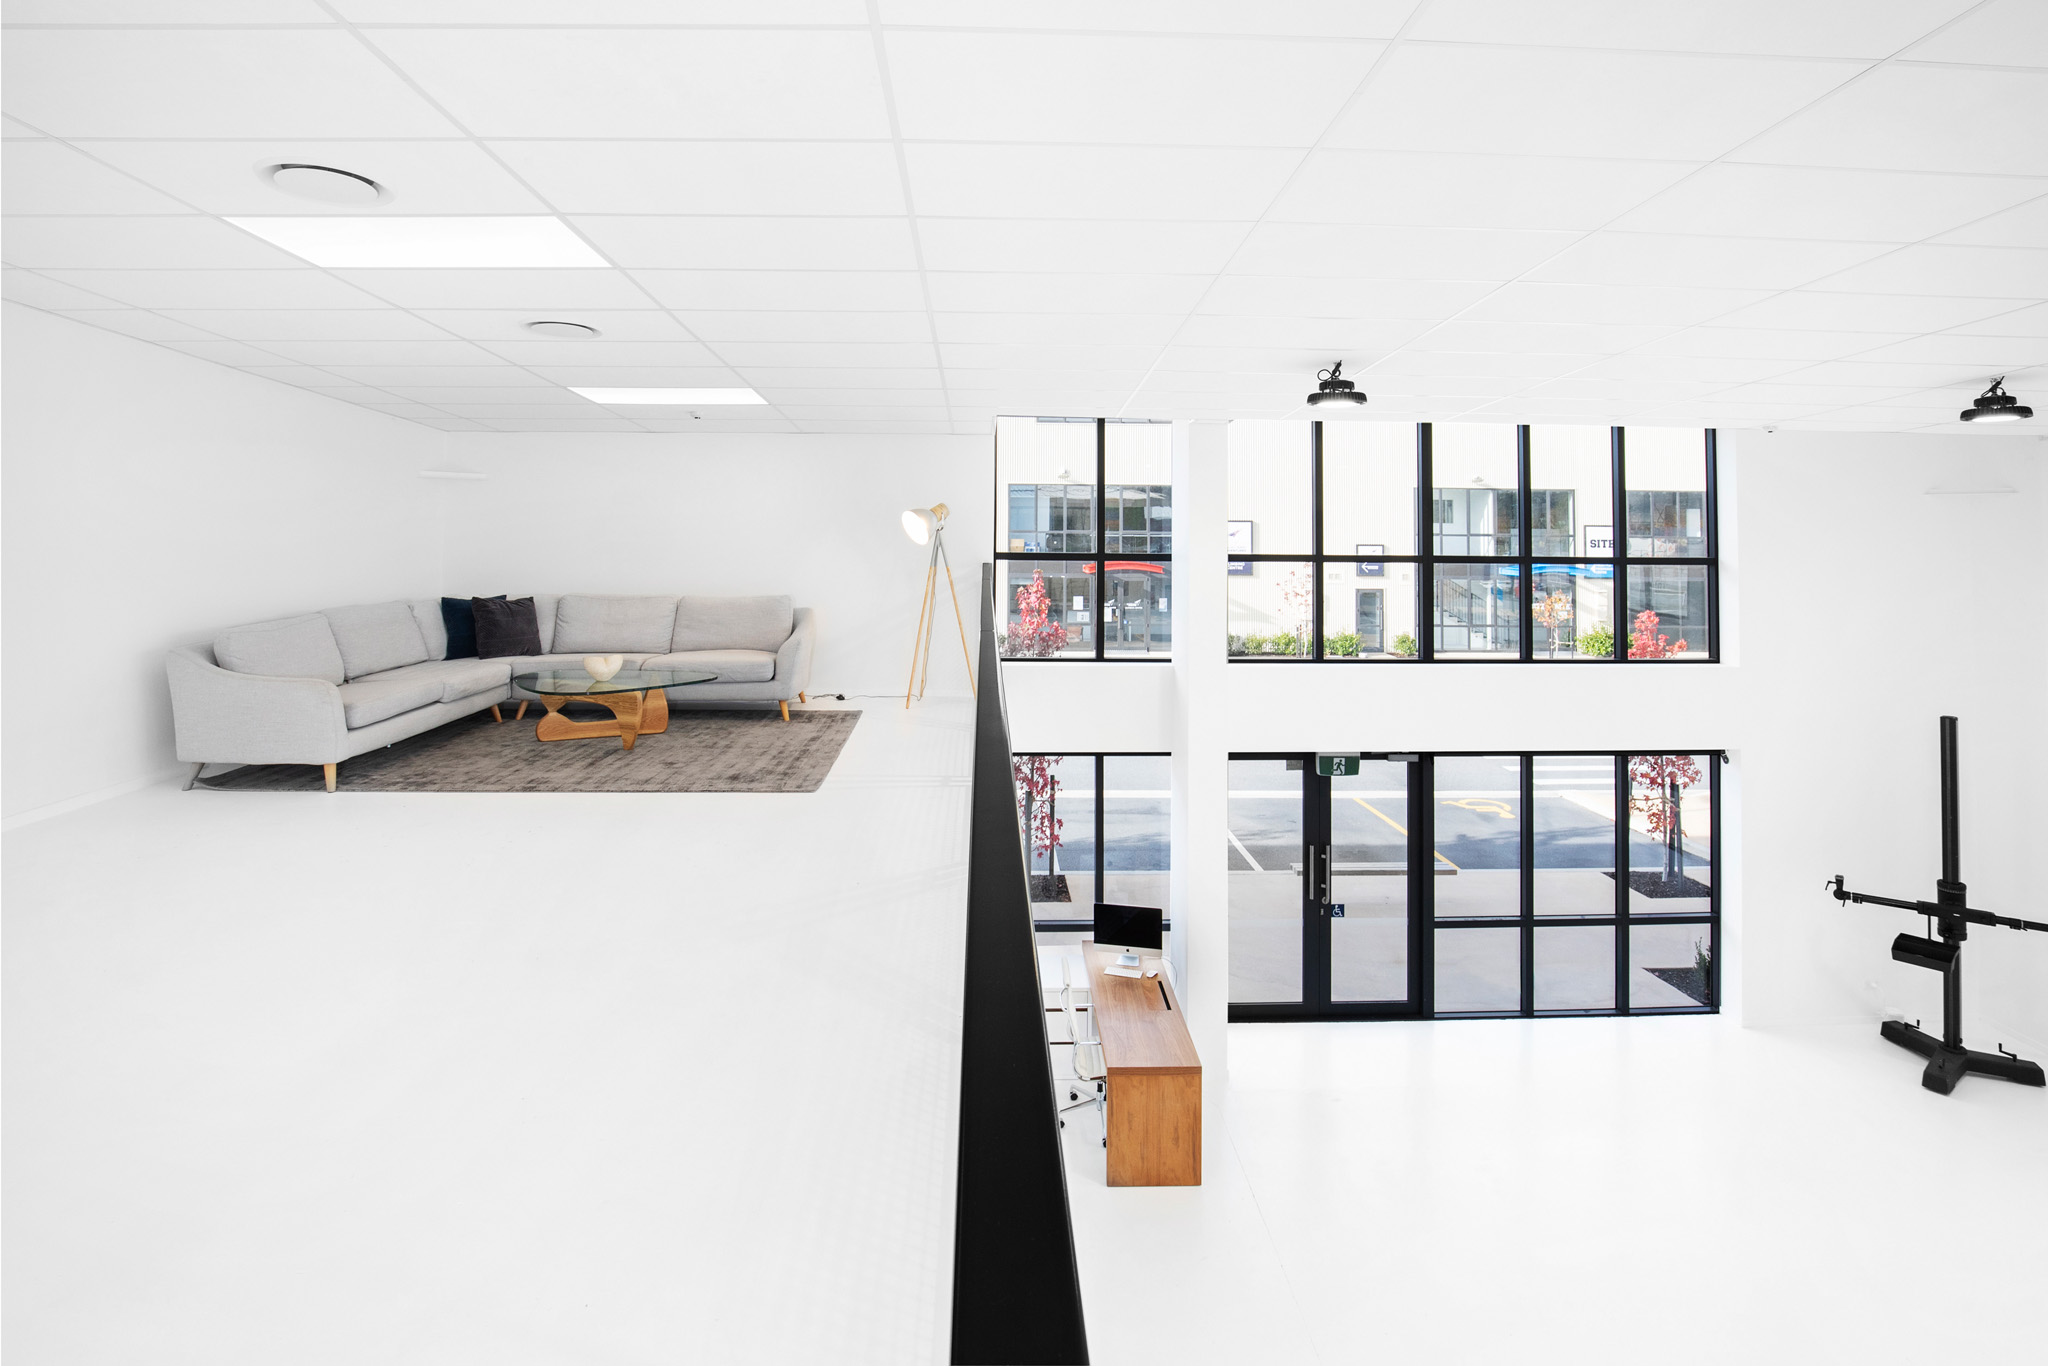 Queenstown Photography and film studios Up Studios